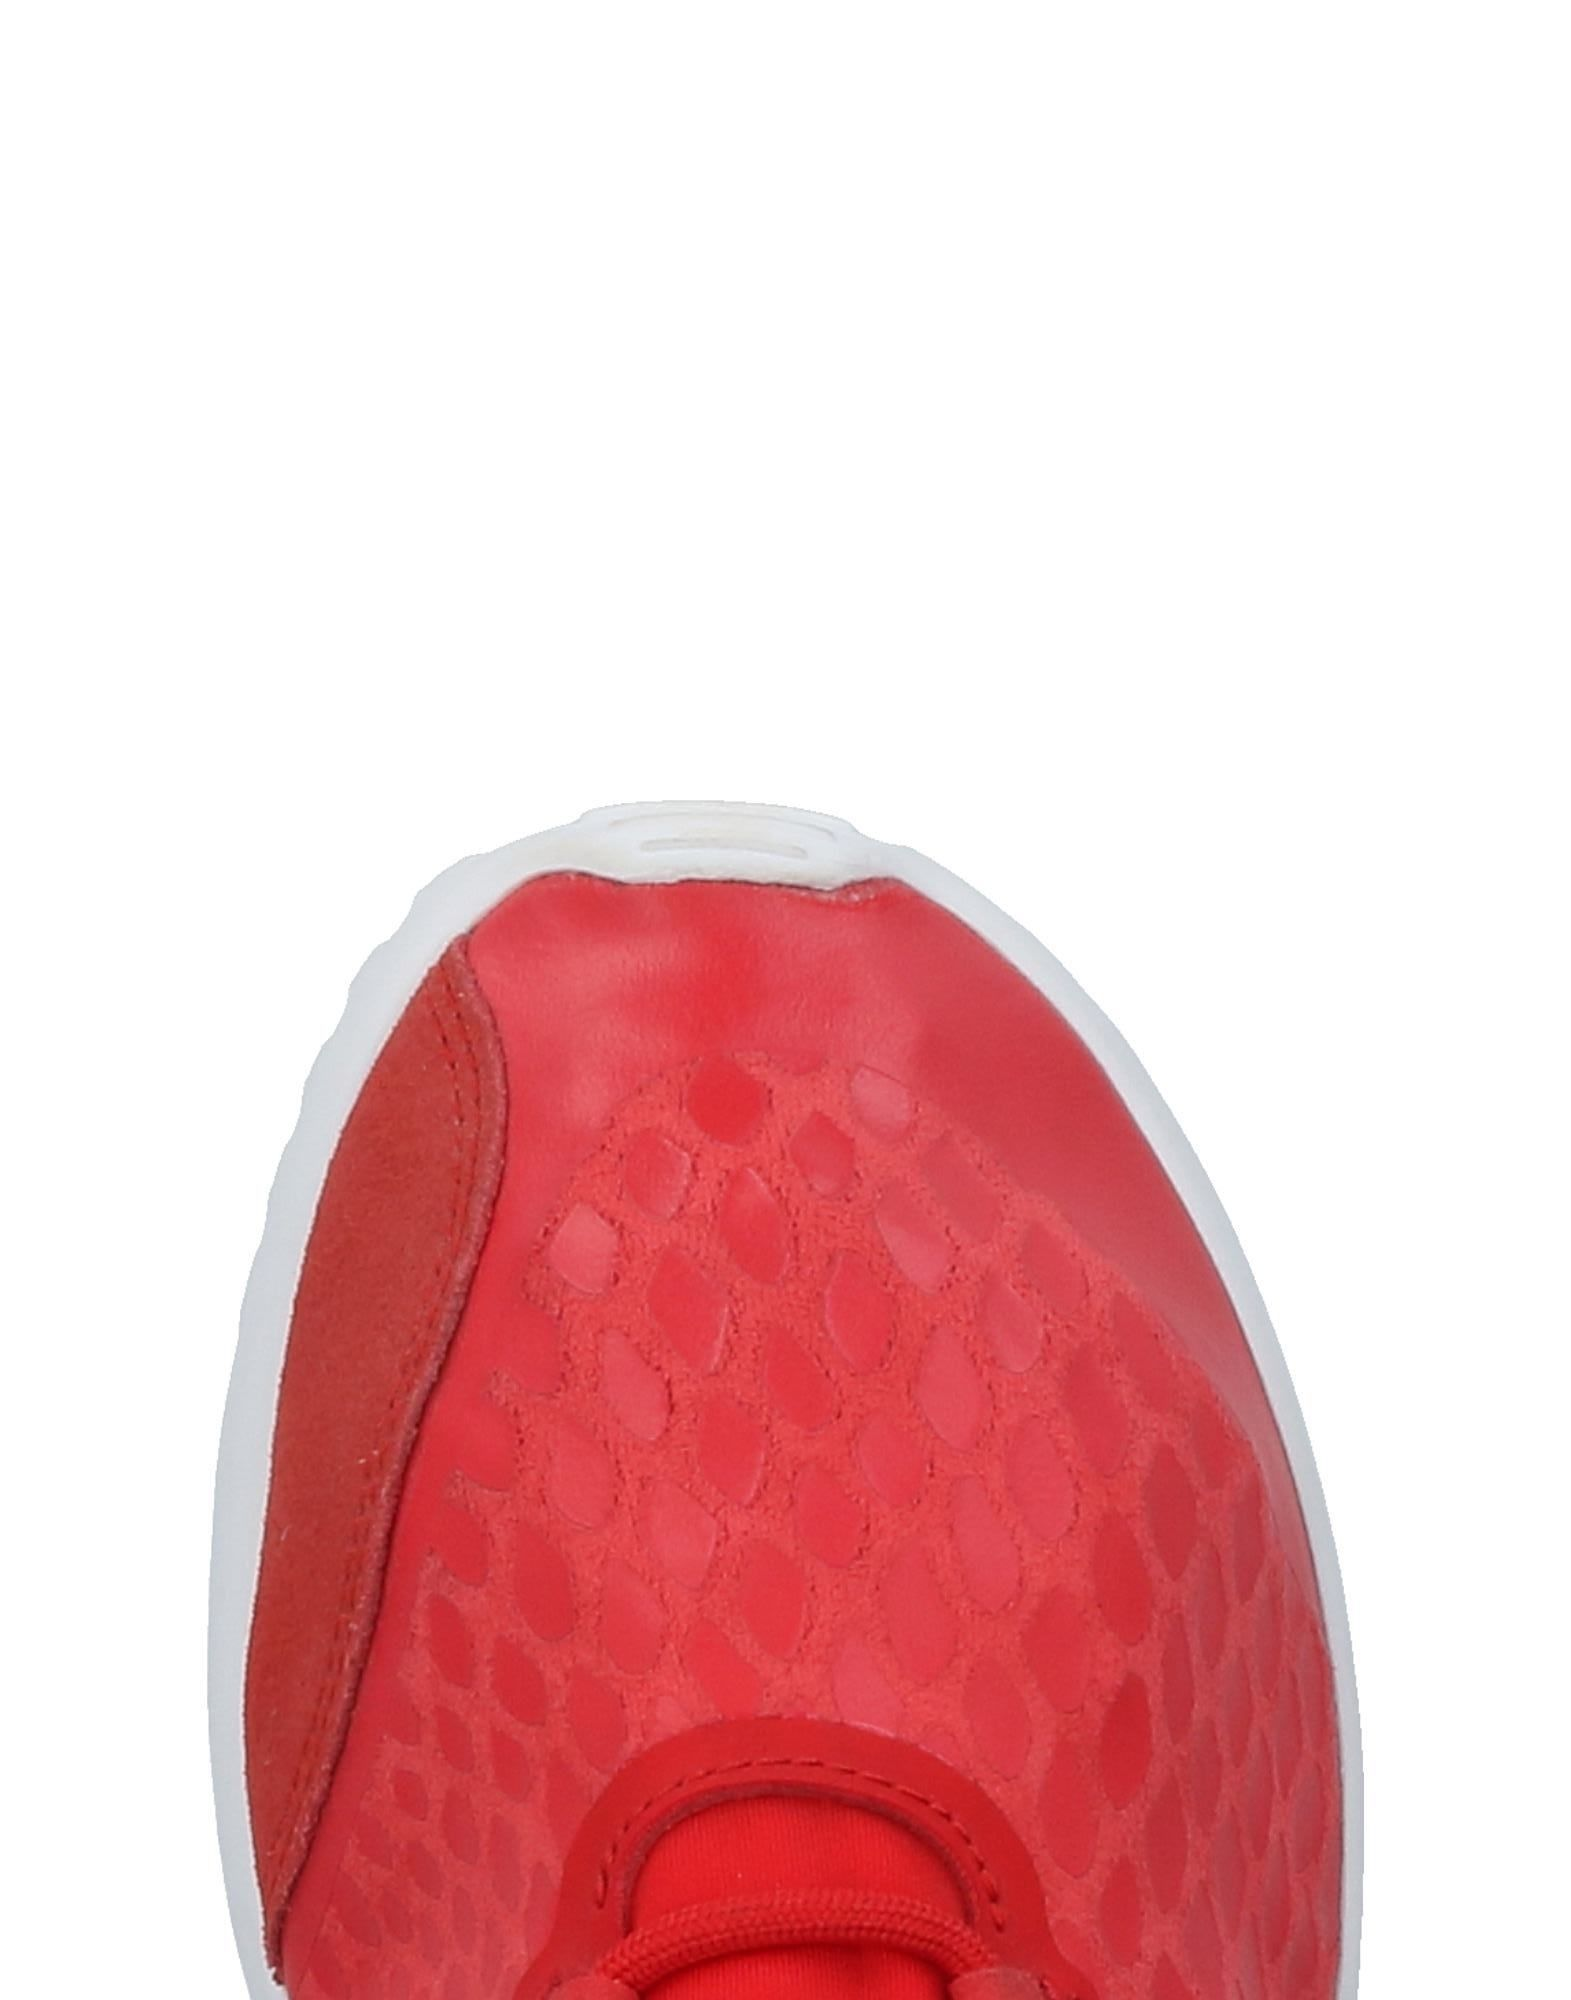 Adidas Originals Damen Sneakers Damen Originals  11486374CH Neue Schuhe 78f71d